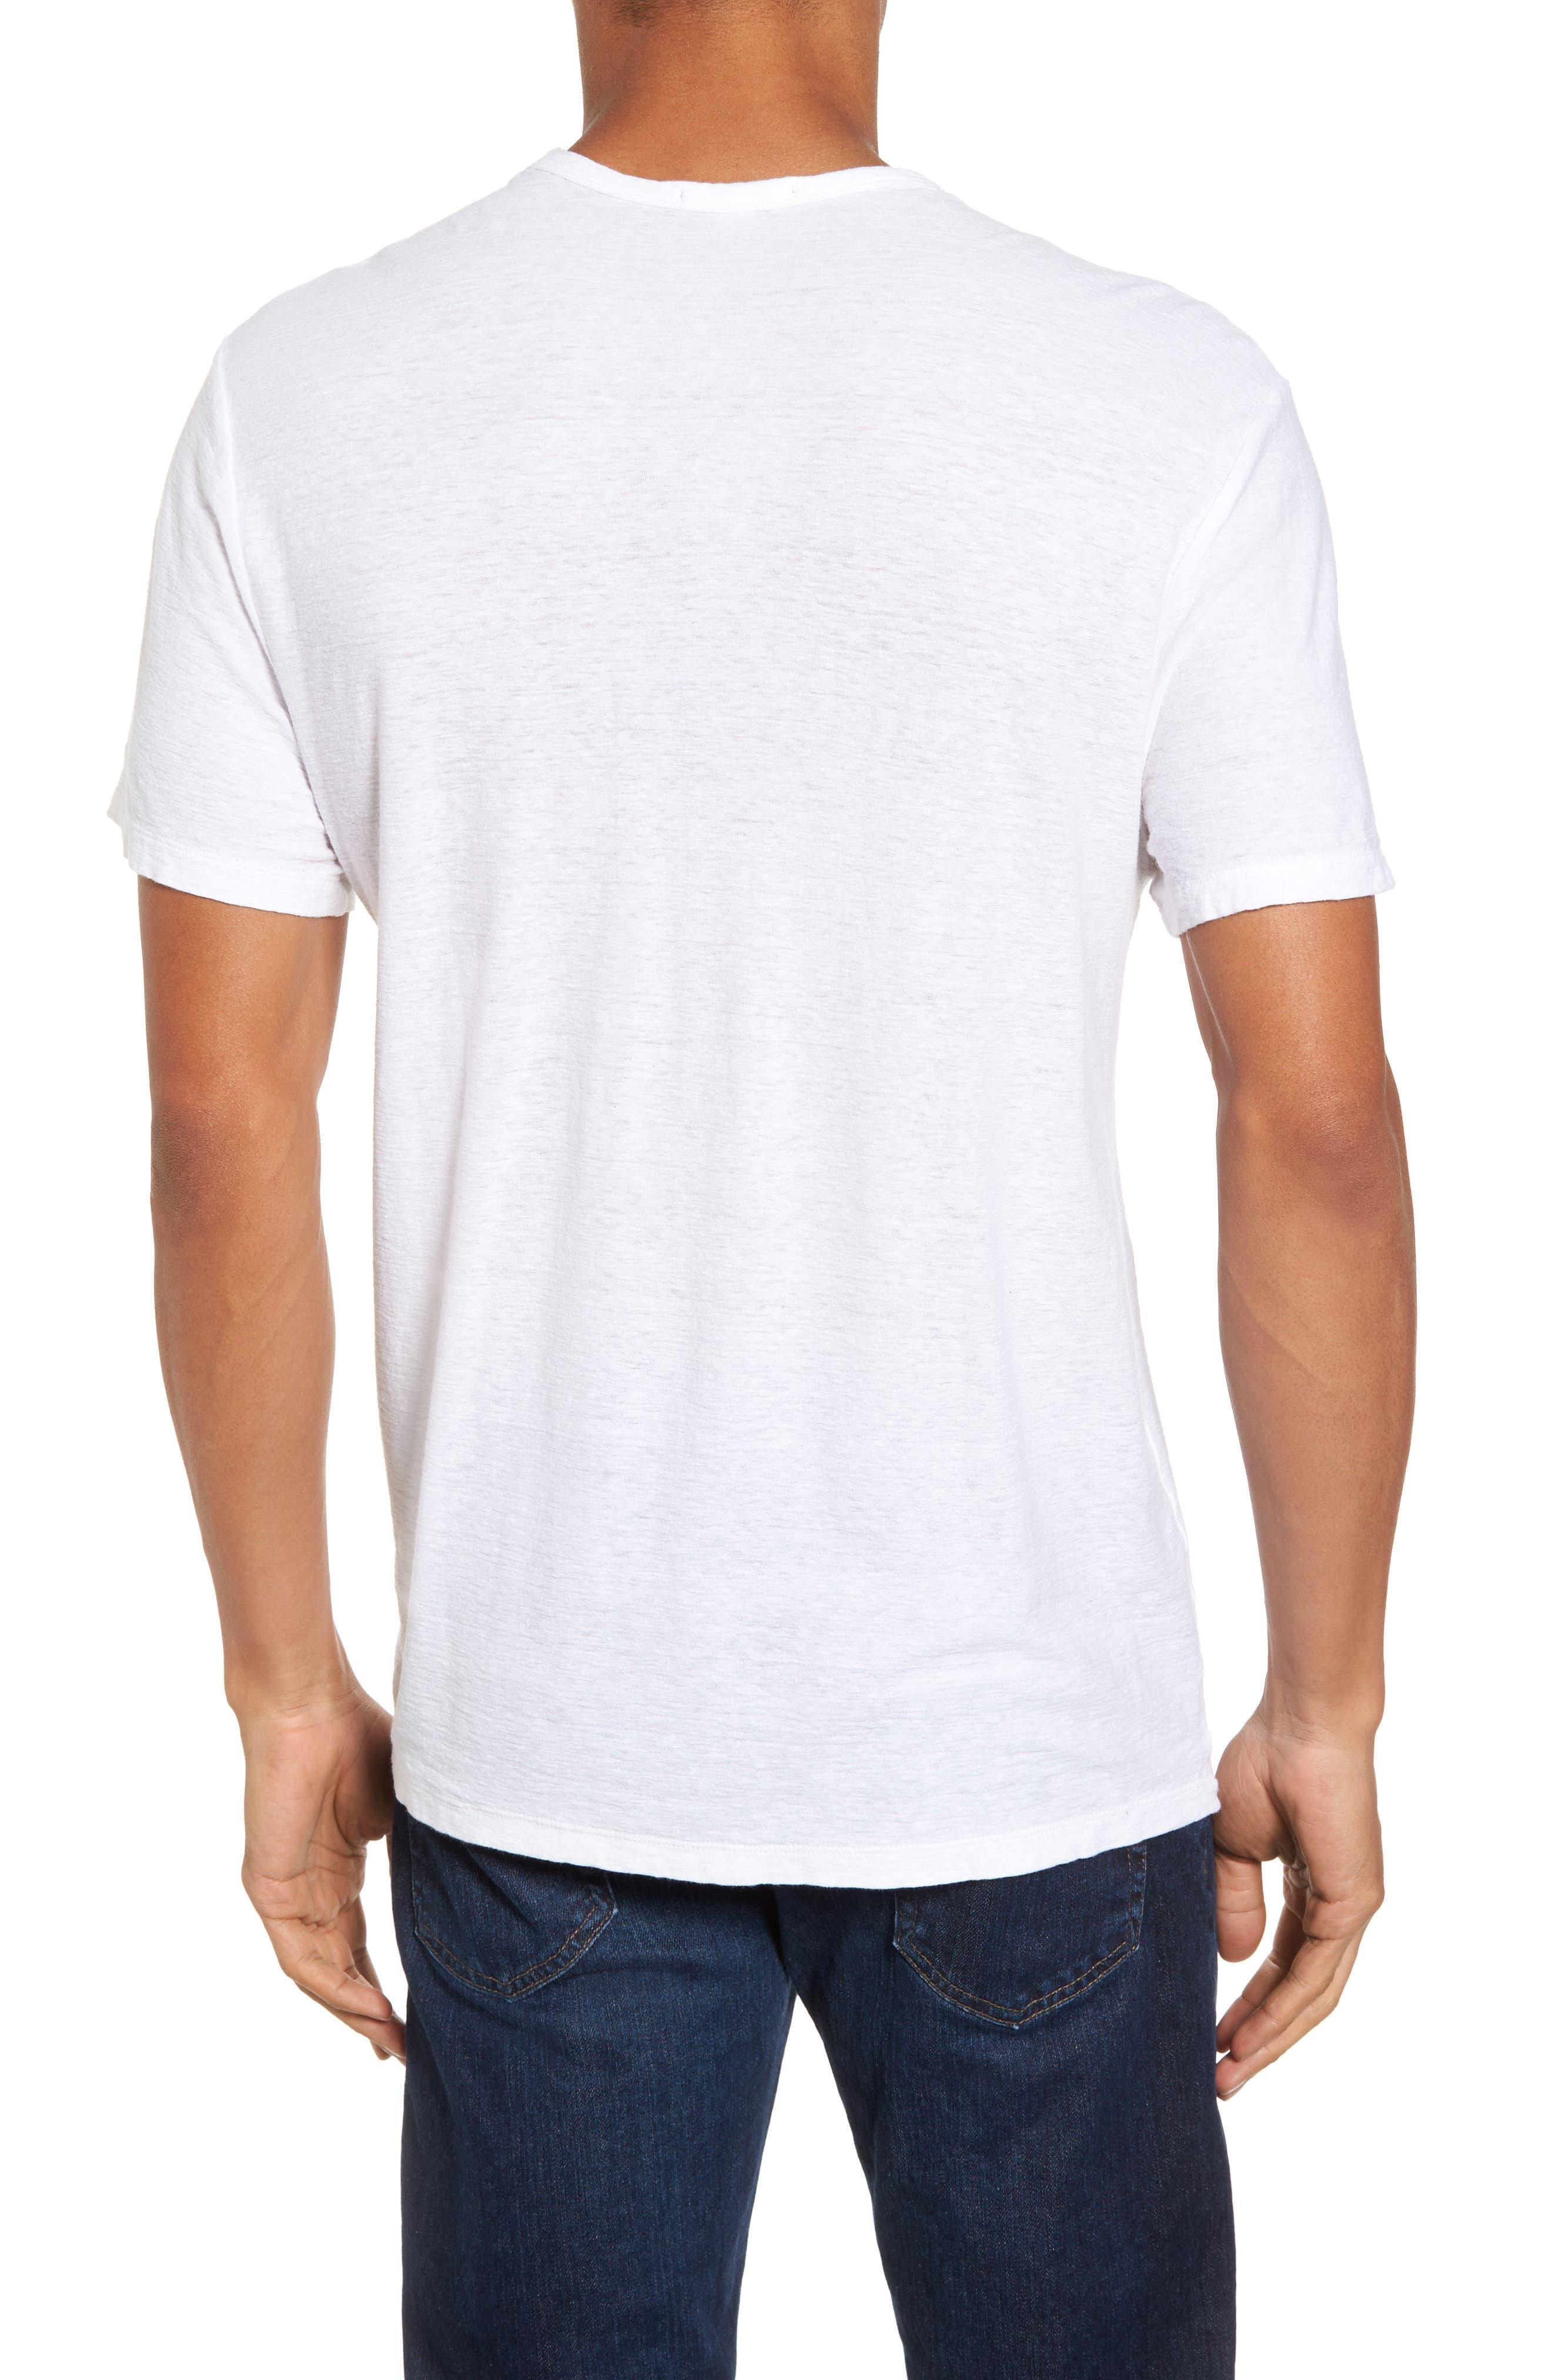 Alternate Image 2  - James Perse Cotton & Linen Pocket T-Shirt